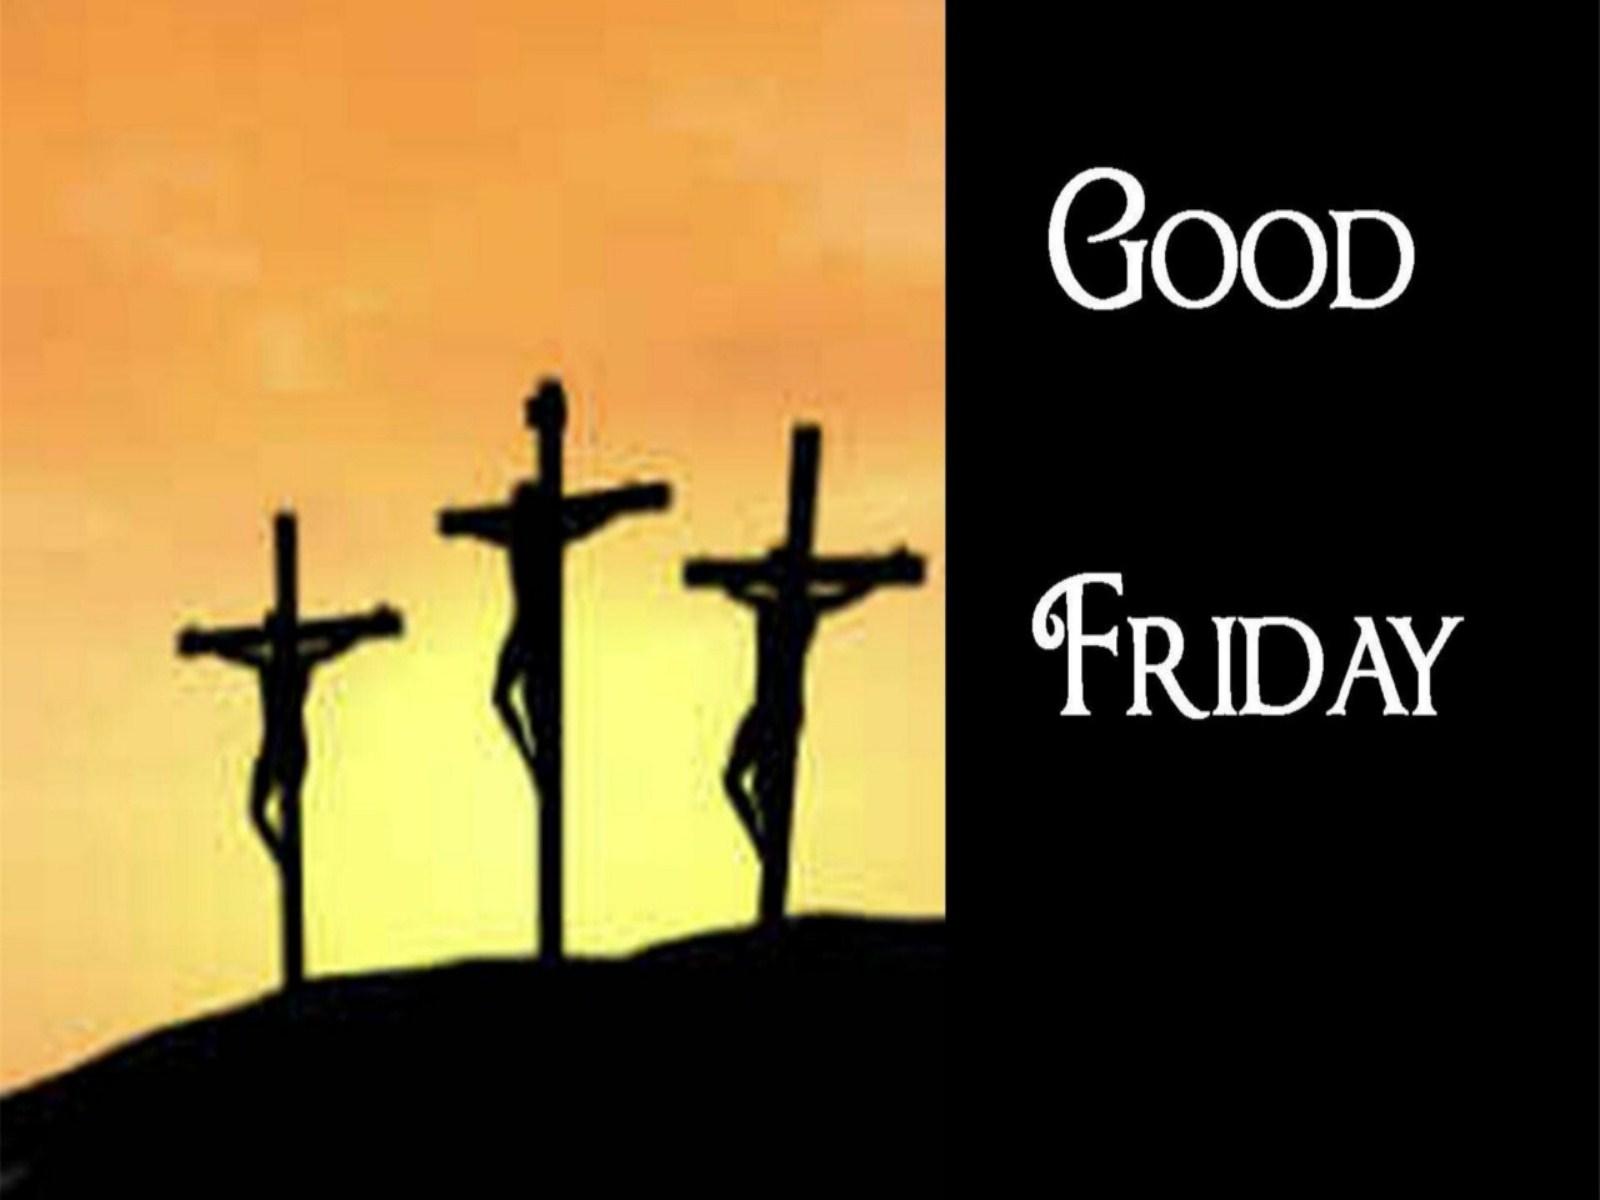 Good Friday Jesus On Cross Wallpaper Christ The King Catholic